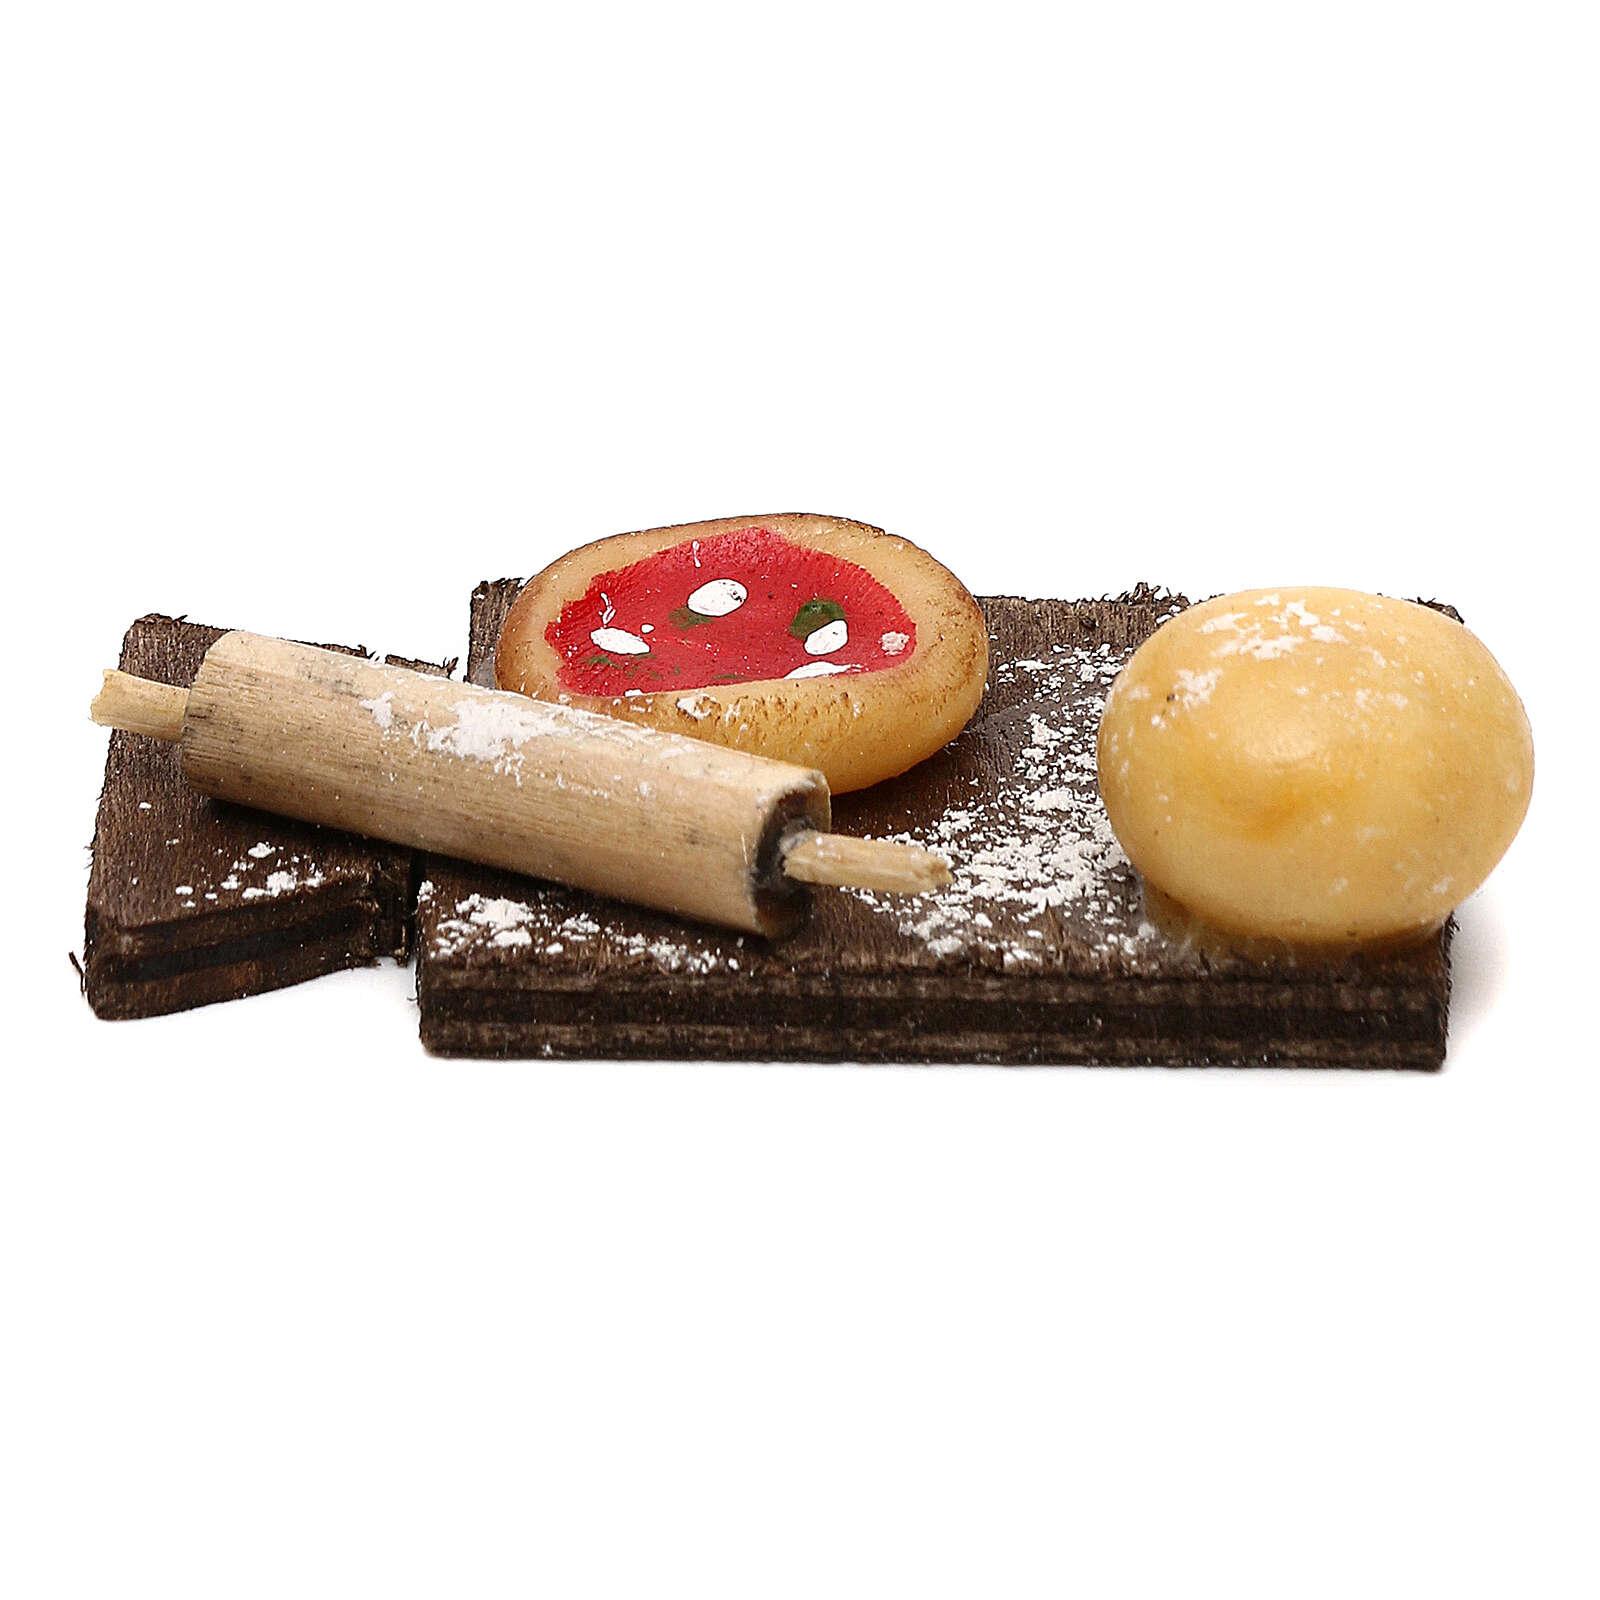 Cutting board with pizza for Neapolitan Nativity scene of 24 cm 4